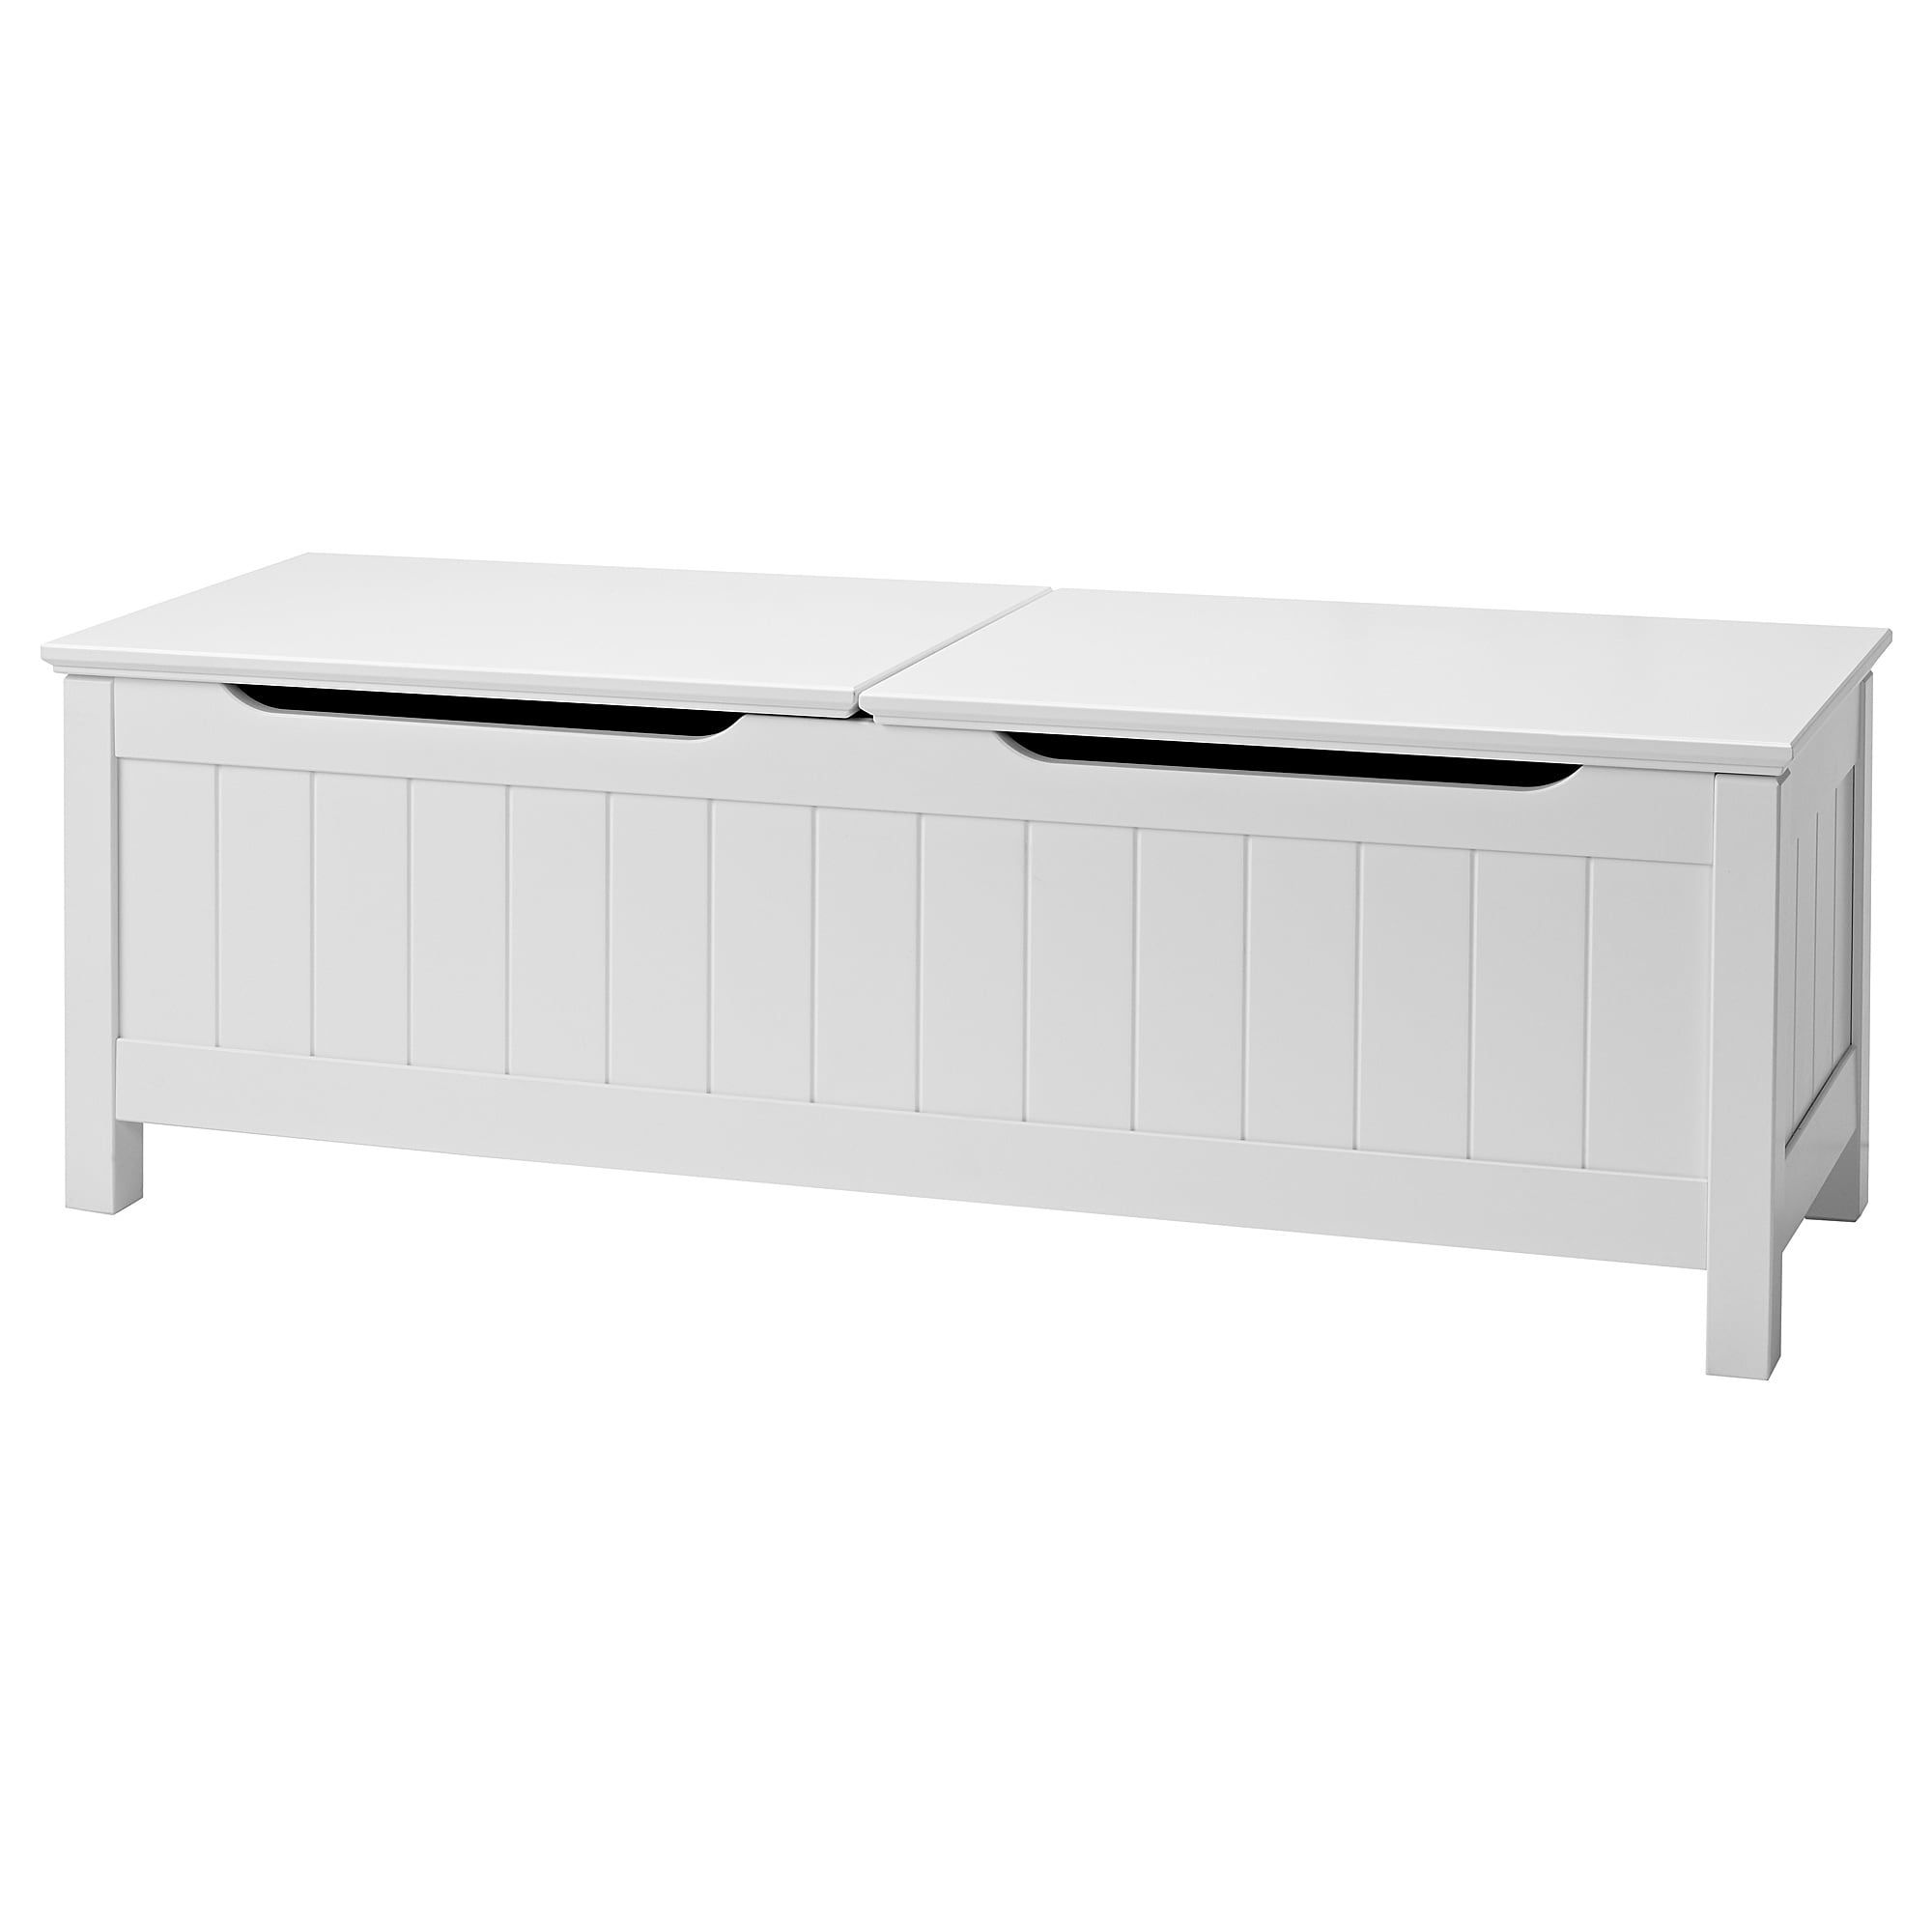 Ikea Undredal Banc Coffre Blanc Ikea à Acheter Banc Coffre